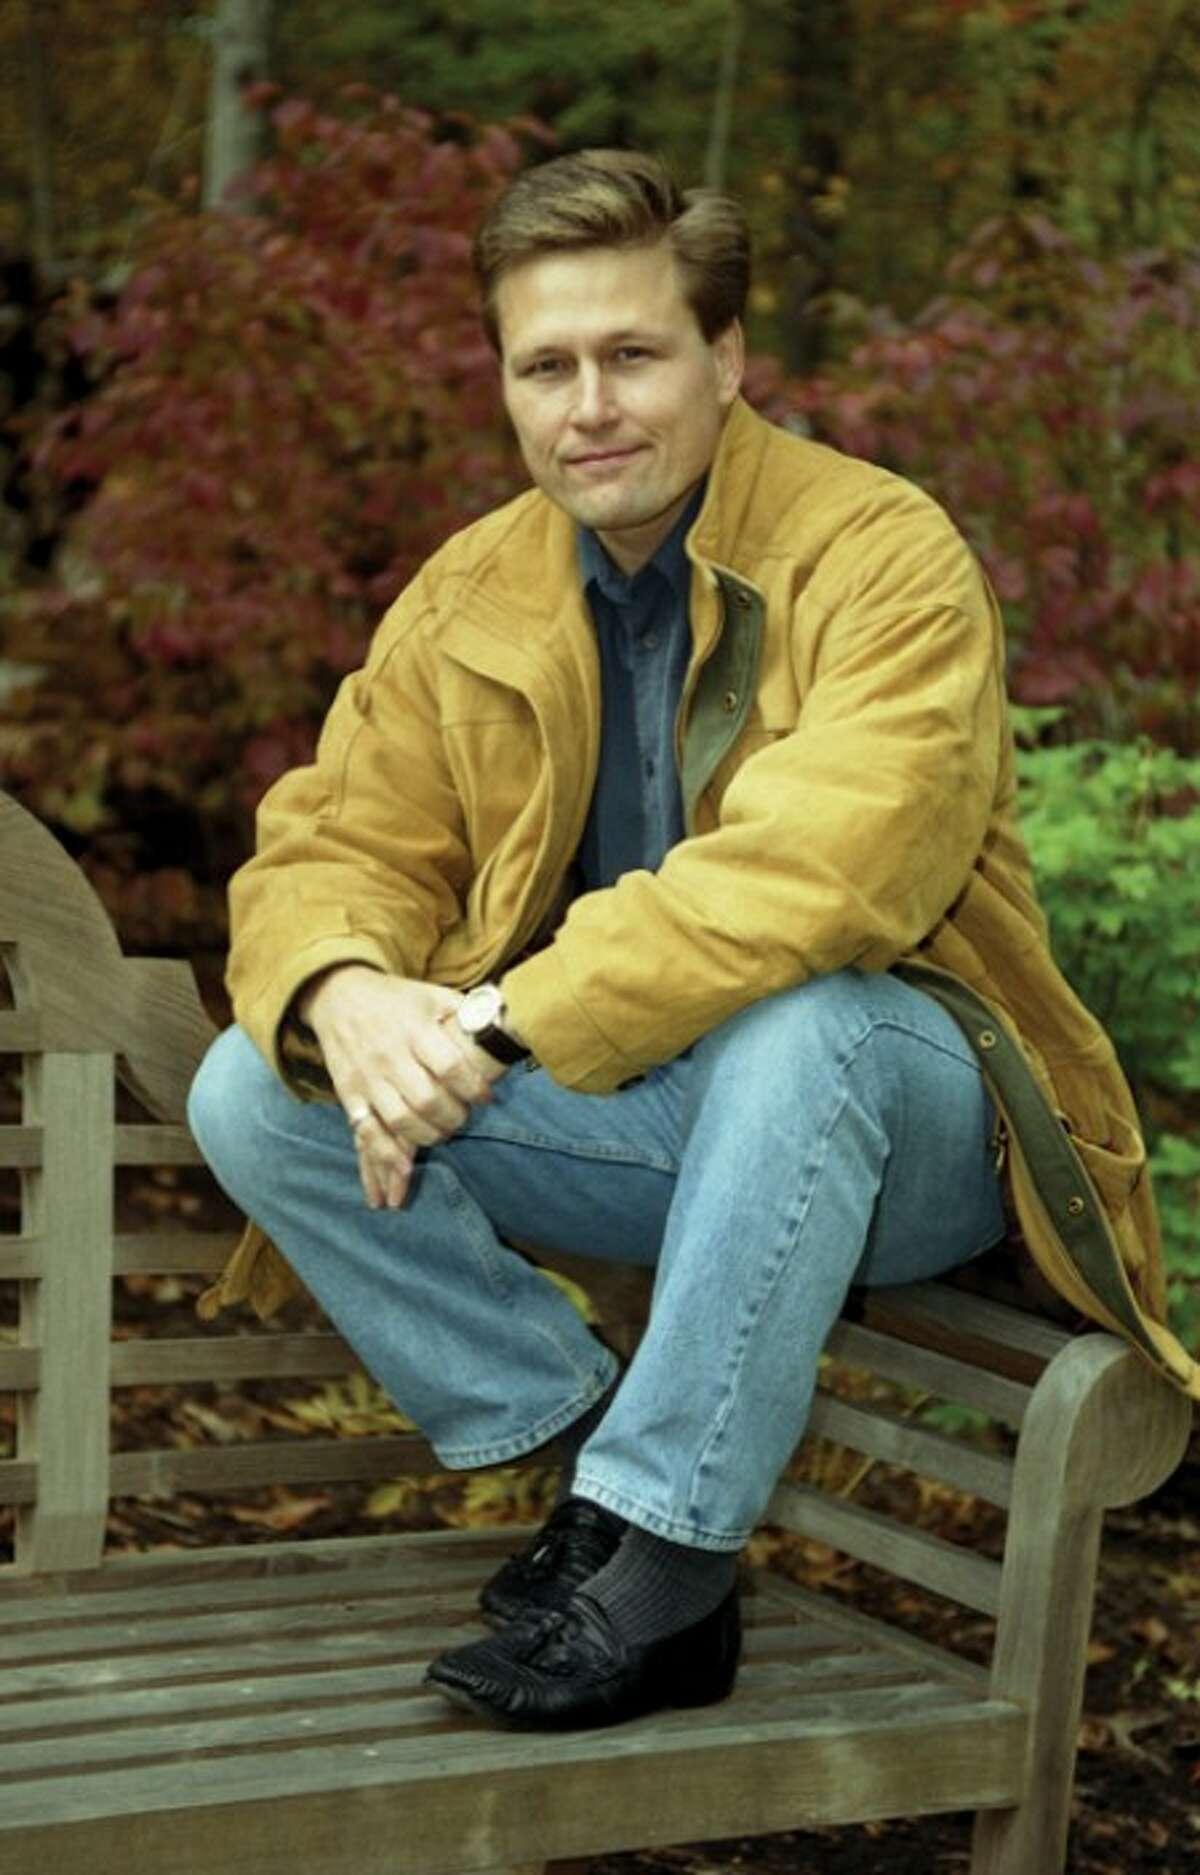 David Baldacci: A writer's job is never done